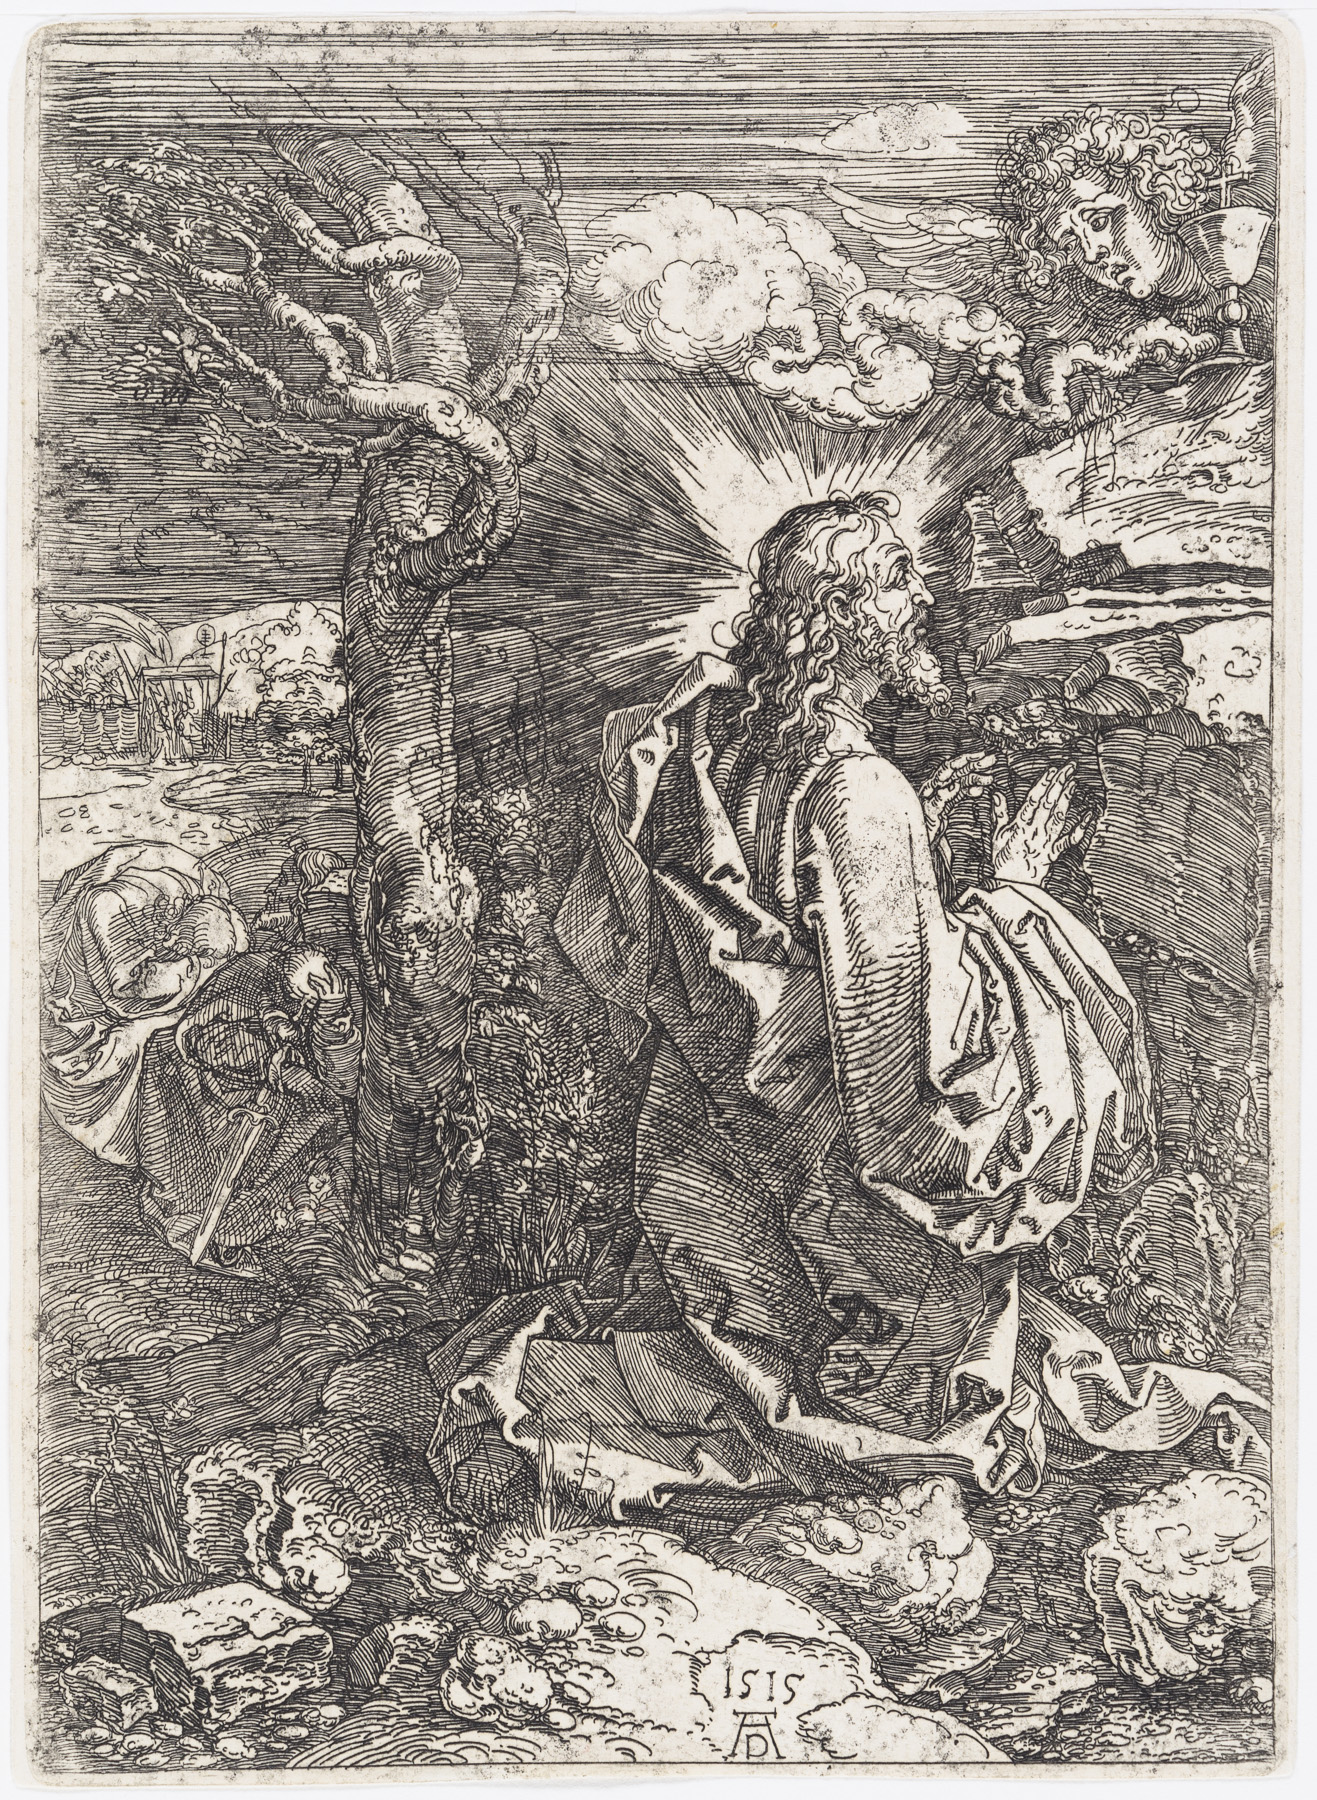 The Agony in the Garden by Albrecht Durer